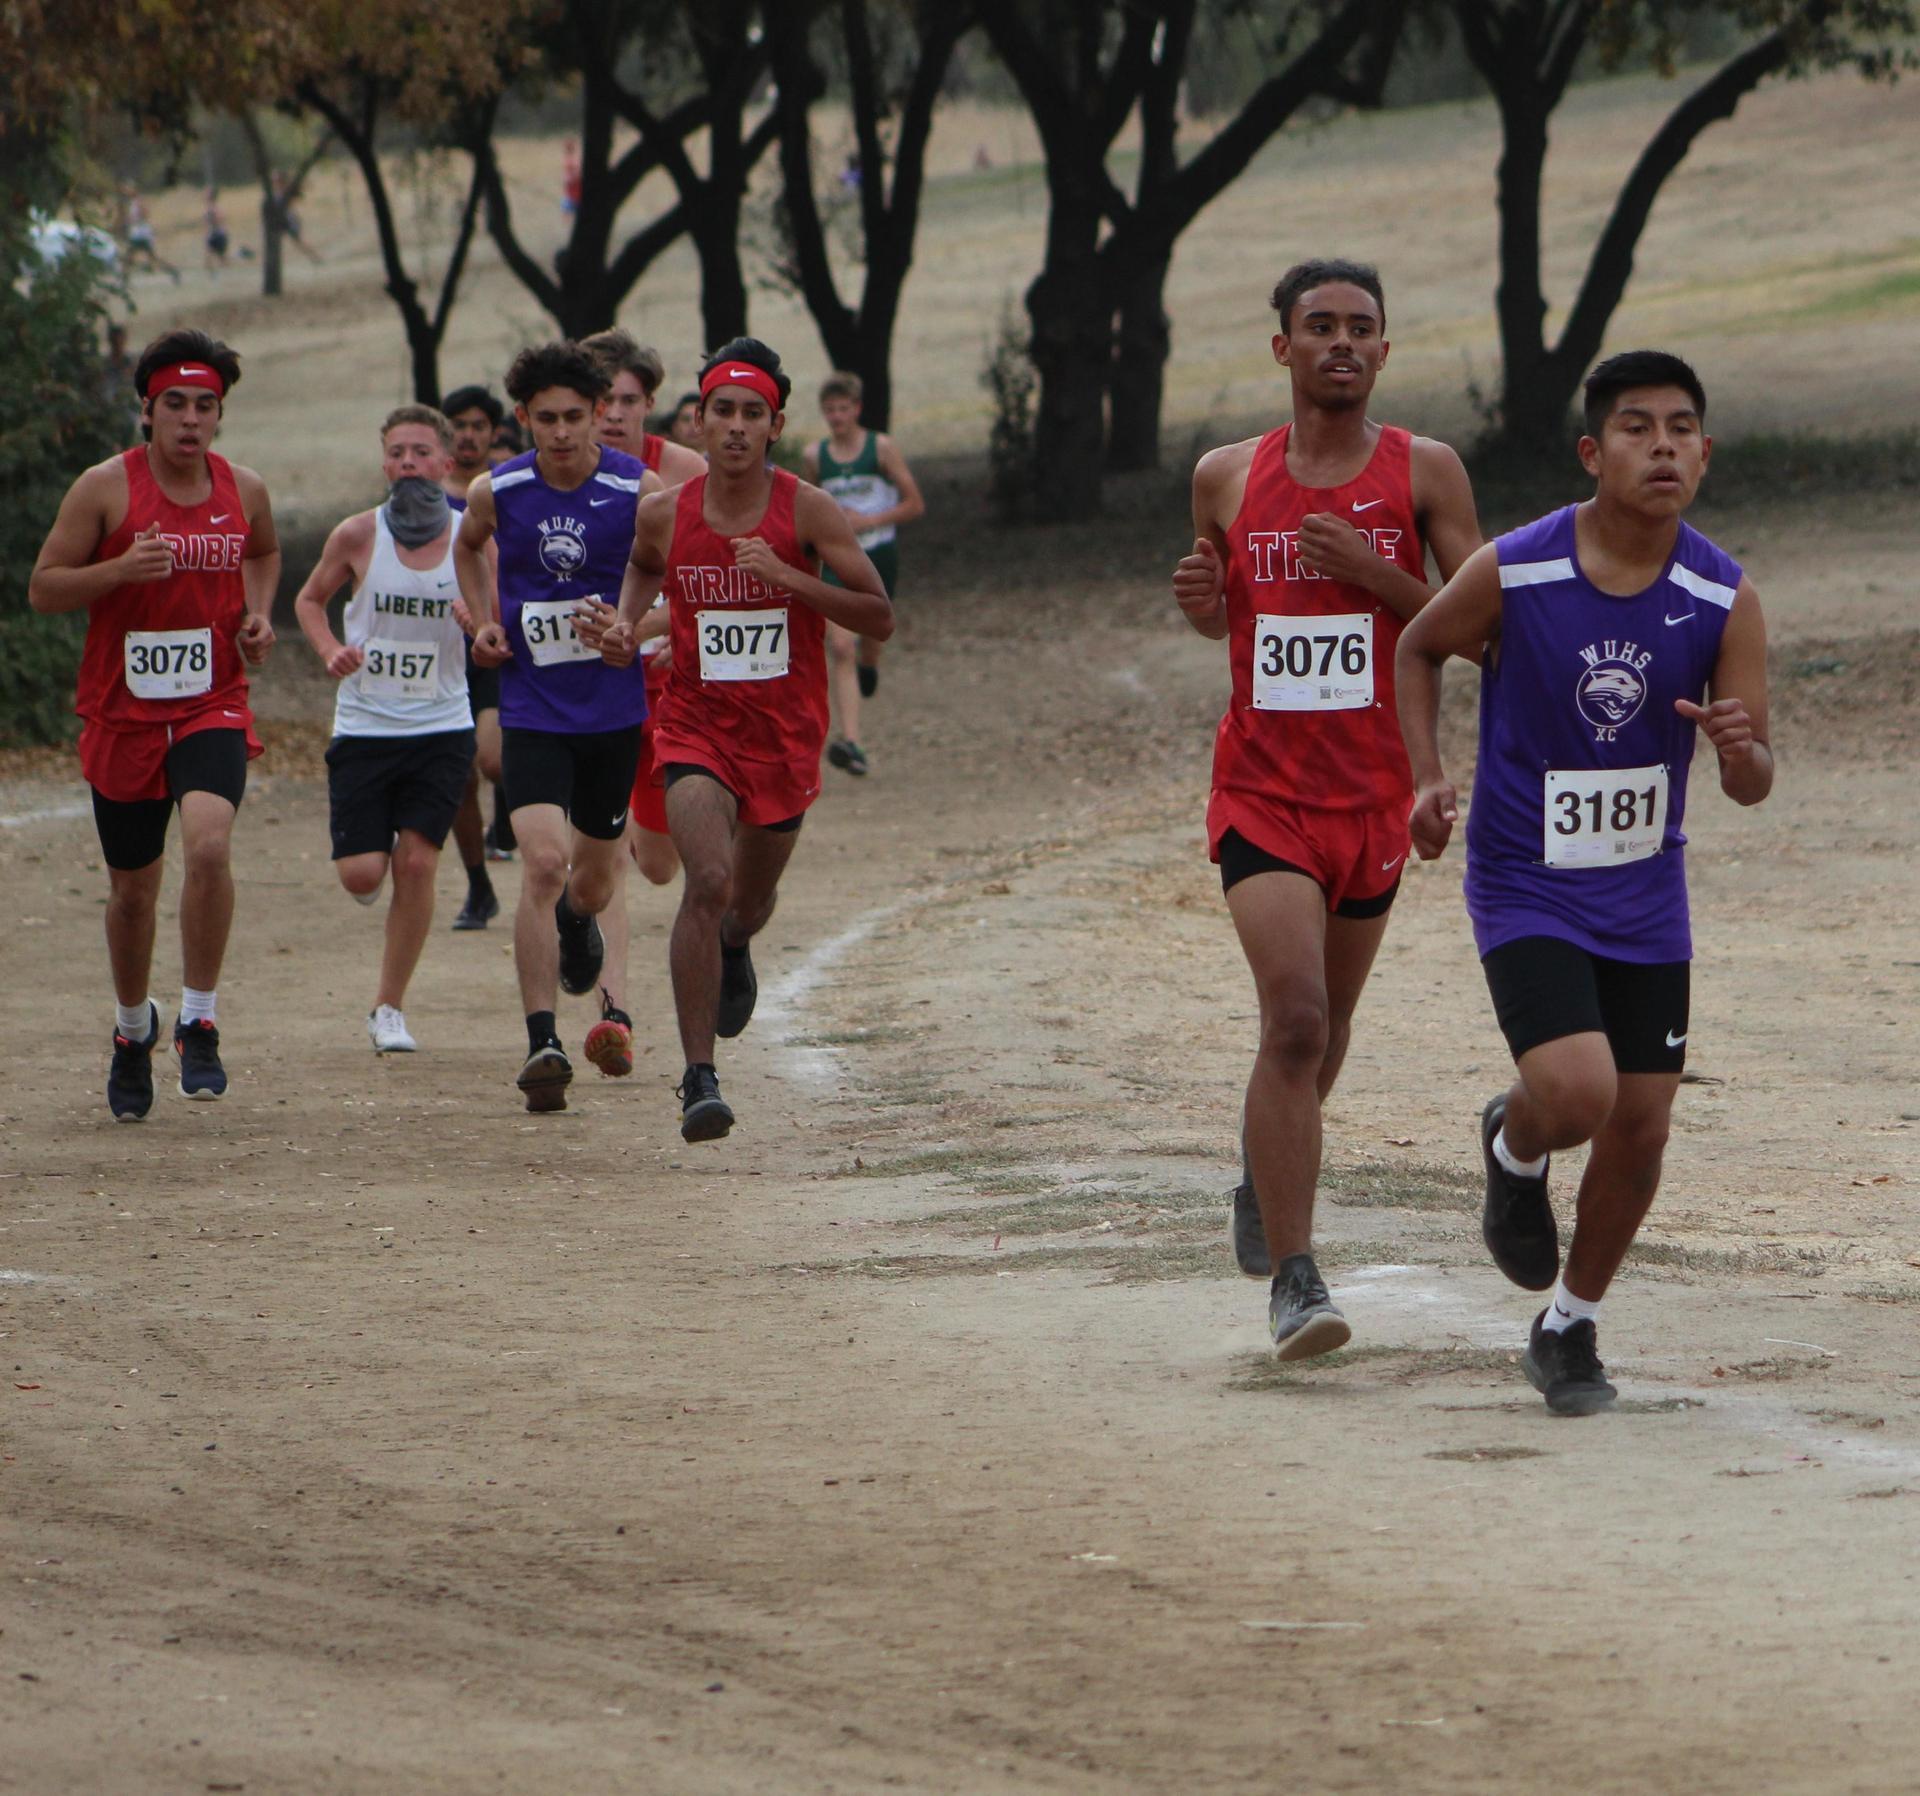 Nicholas Martinez, Raymond Mendoza  racing at woodward park